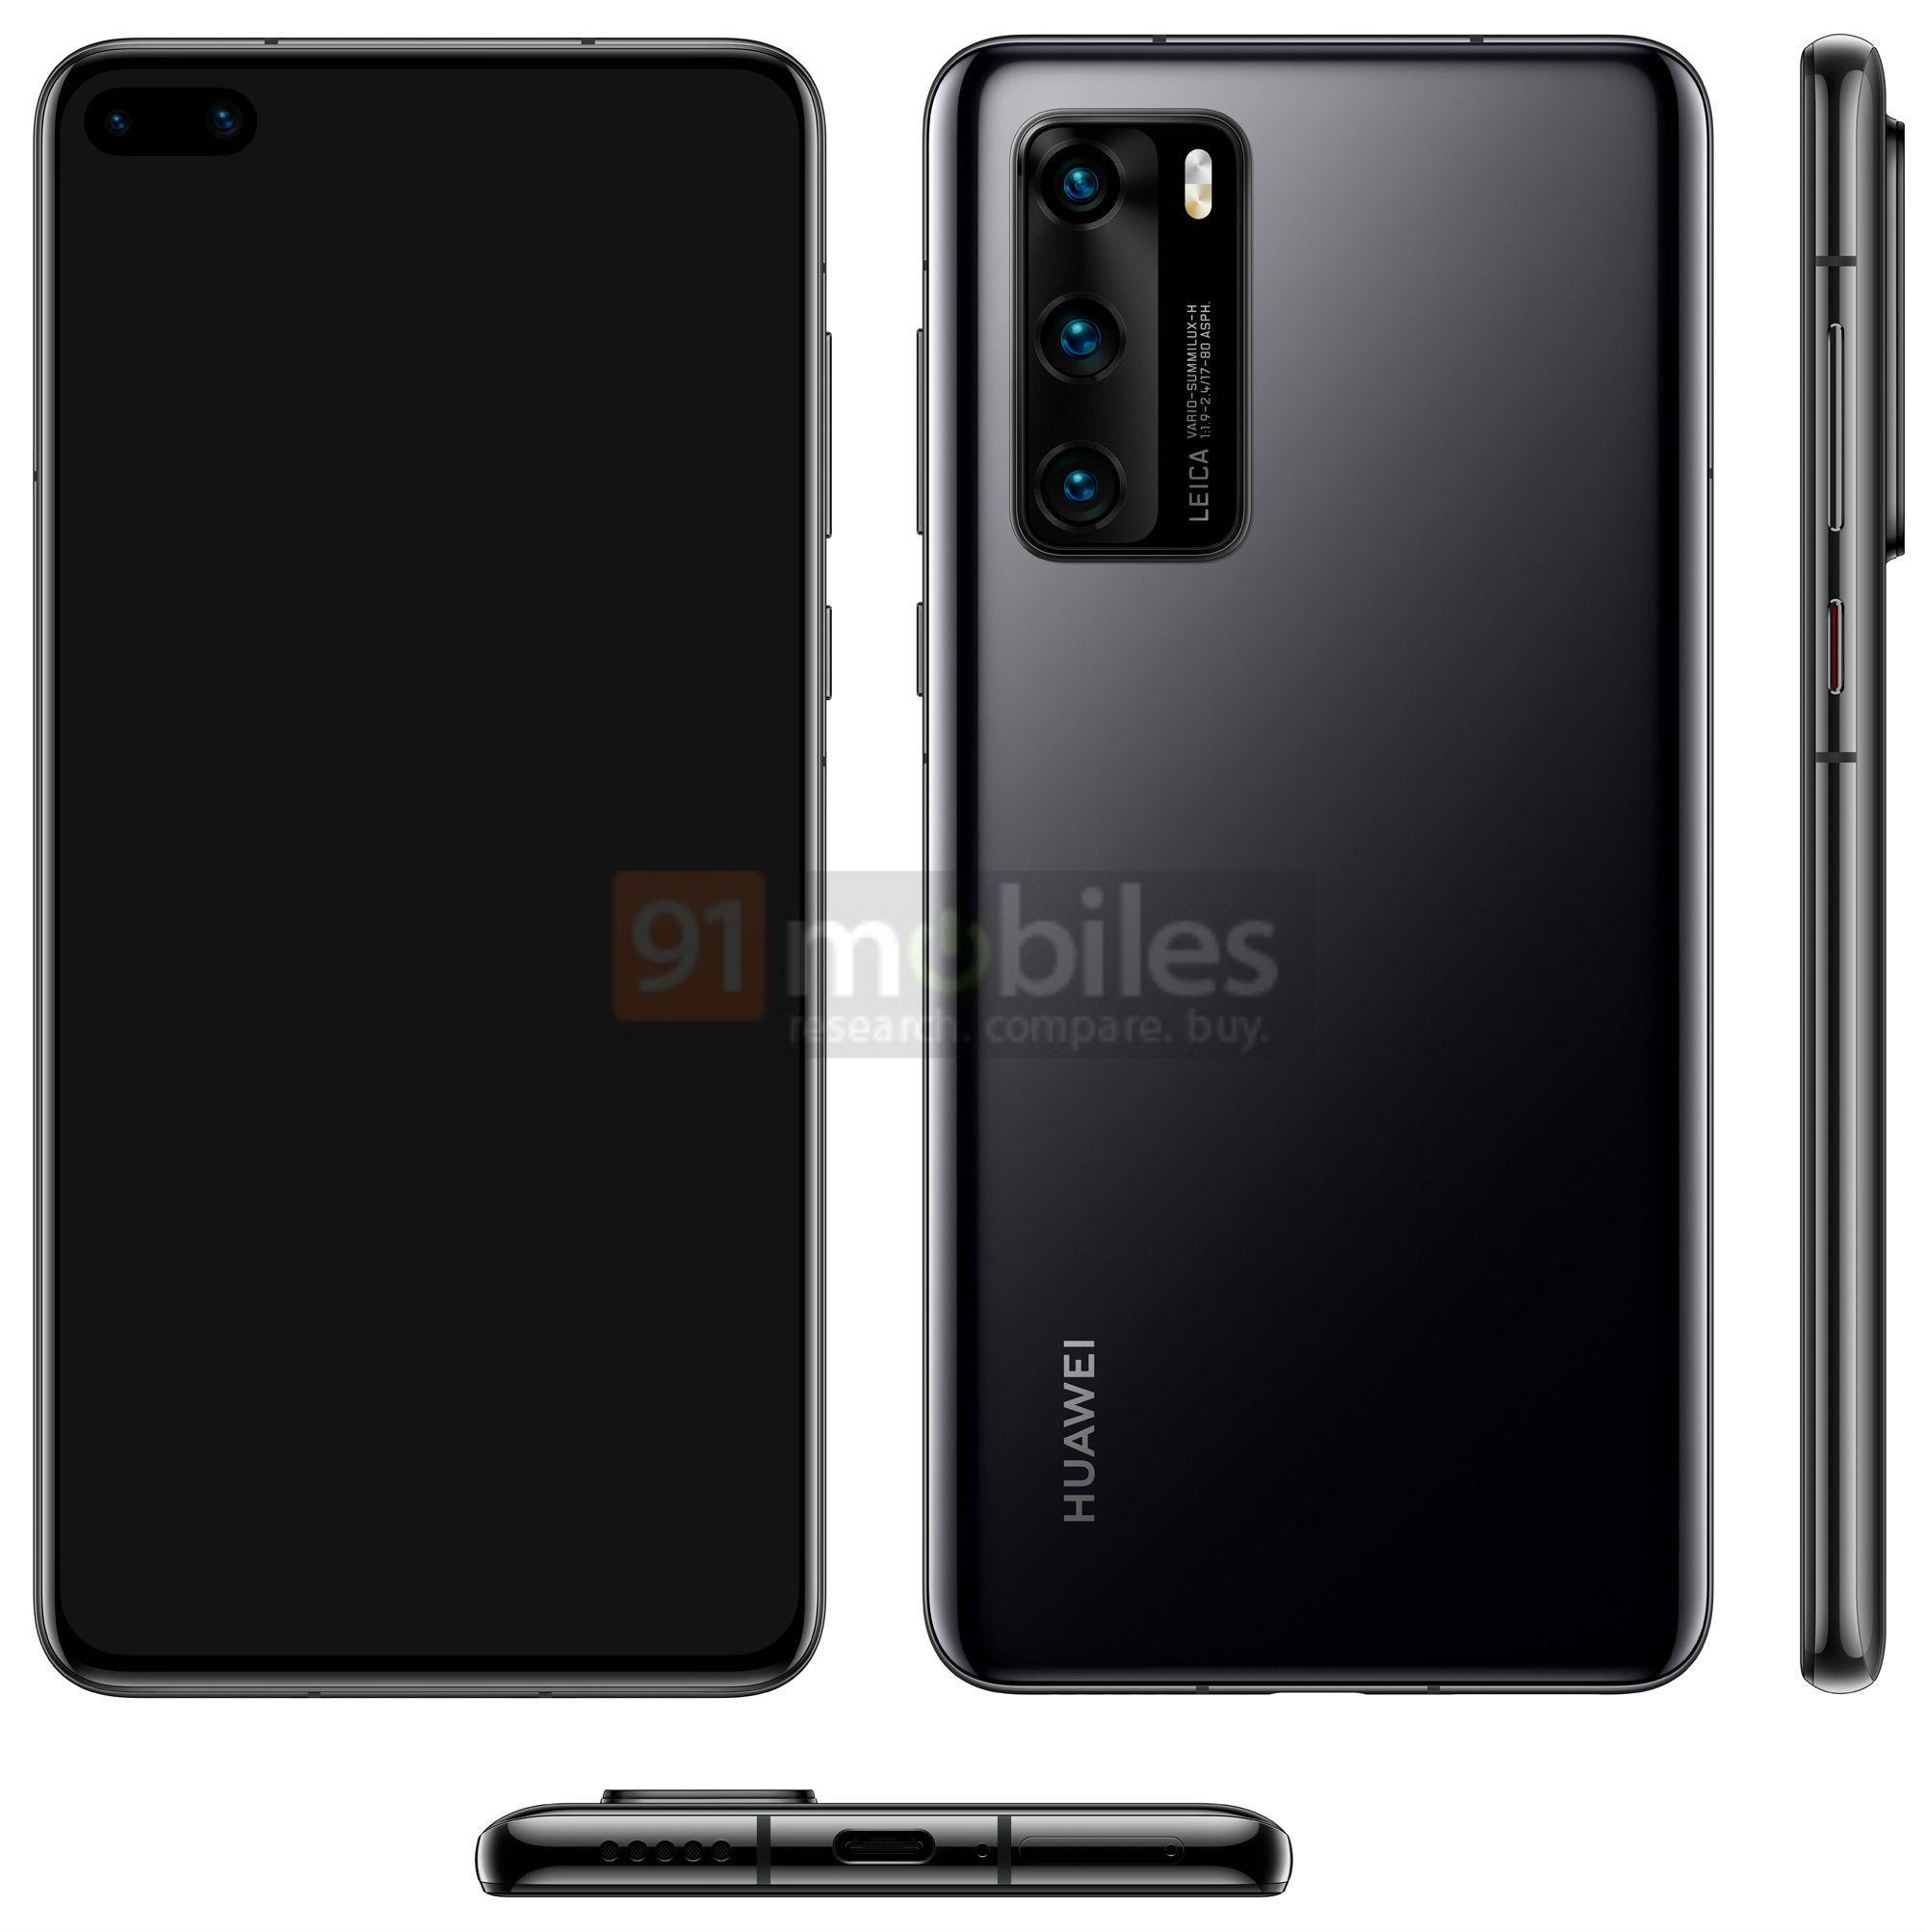 Huawei P40 imagine design